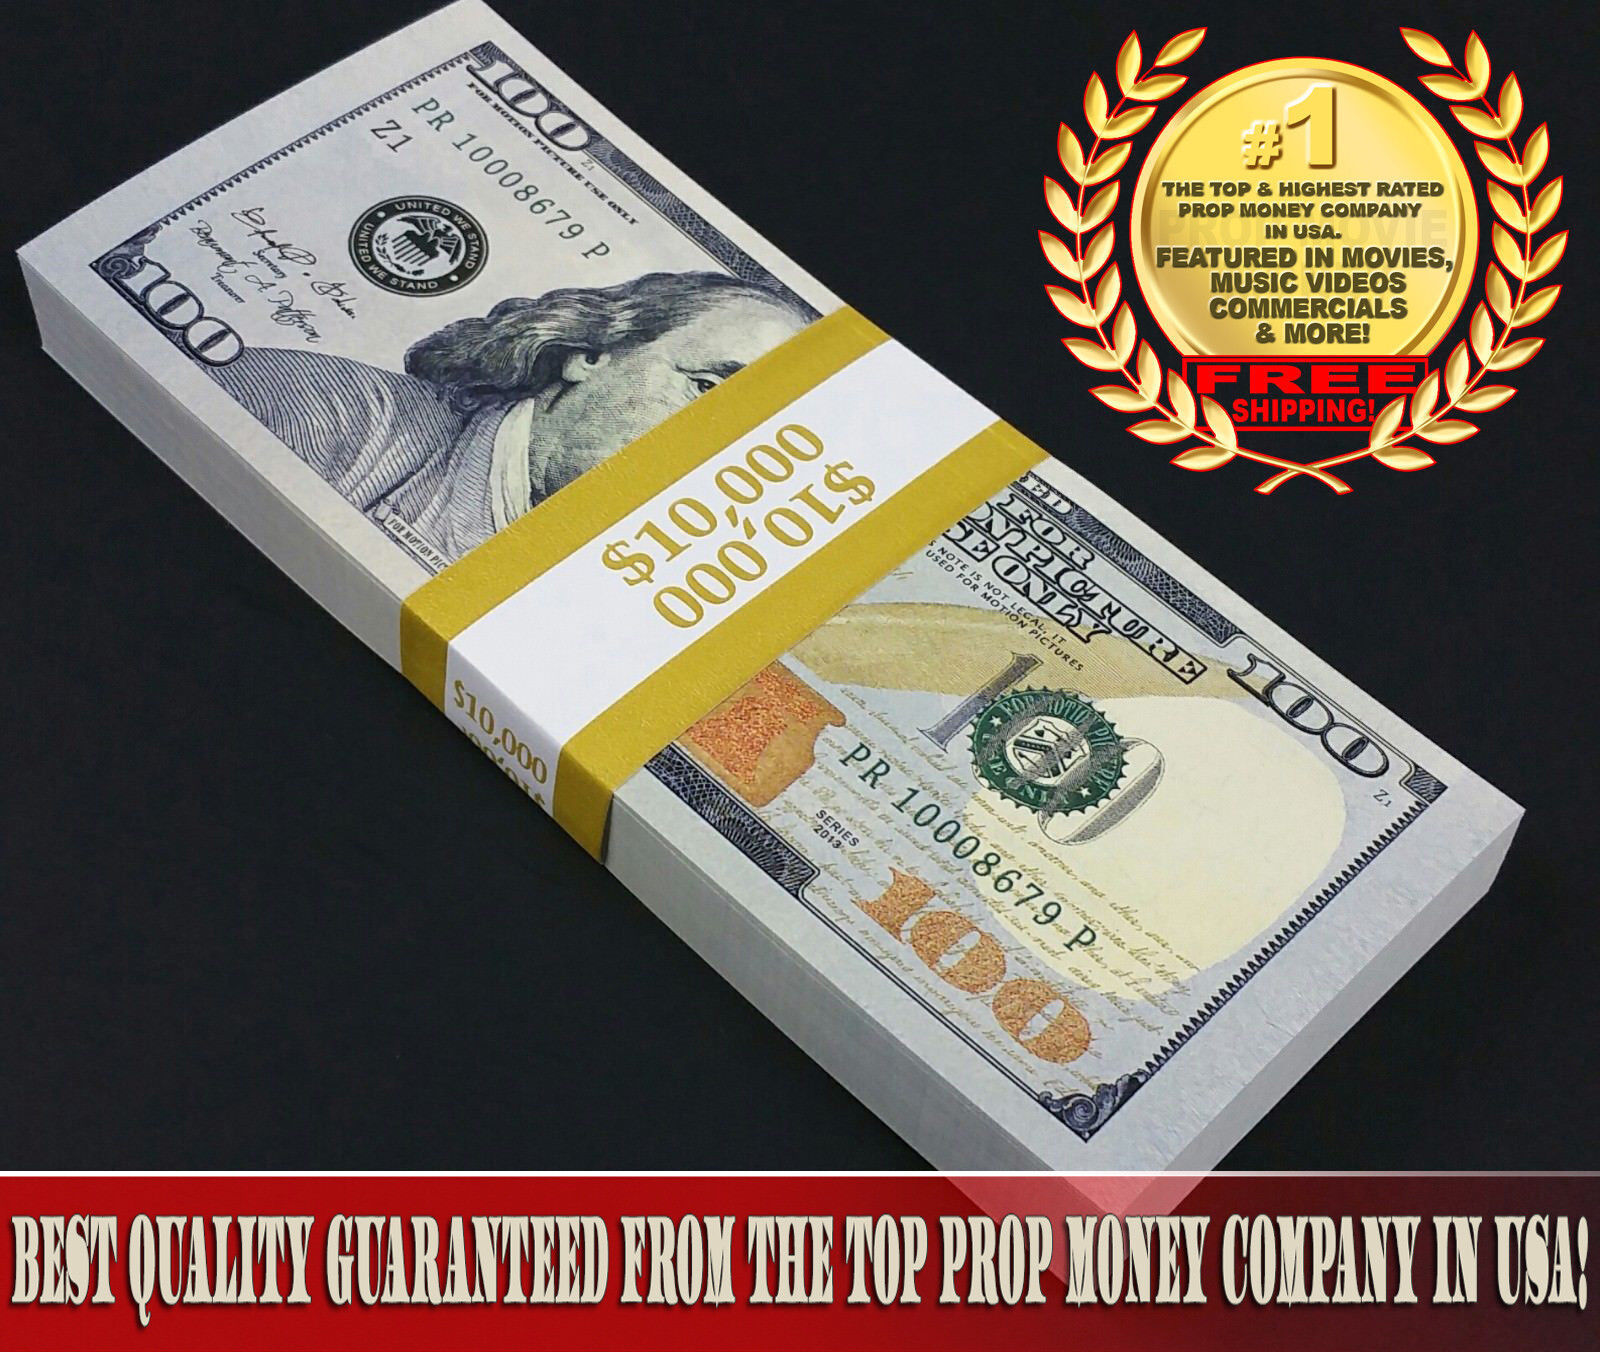 Купить $10,000 - Top Quality New Full Stack For Film, Movie, TV, Play Fake Prop Money